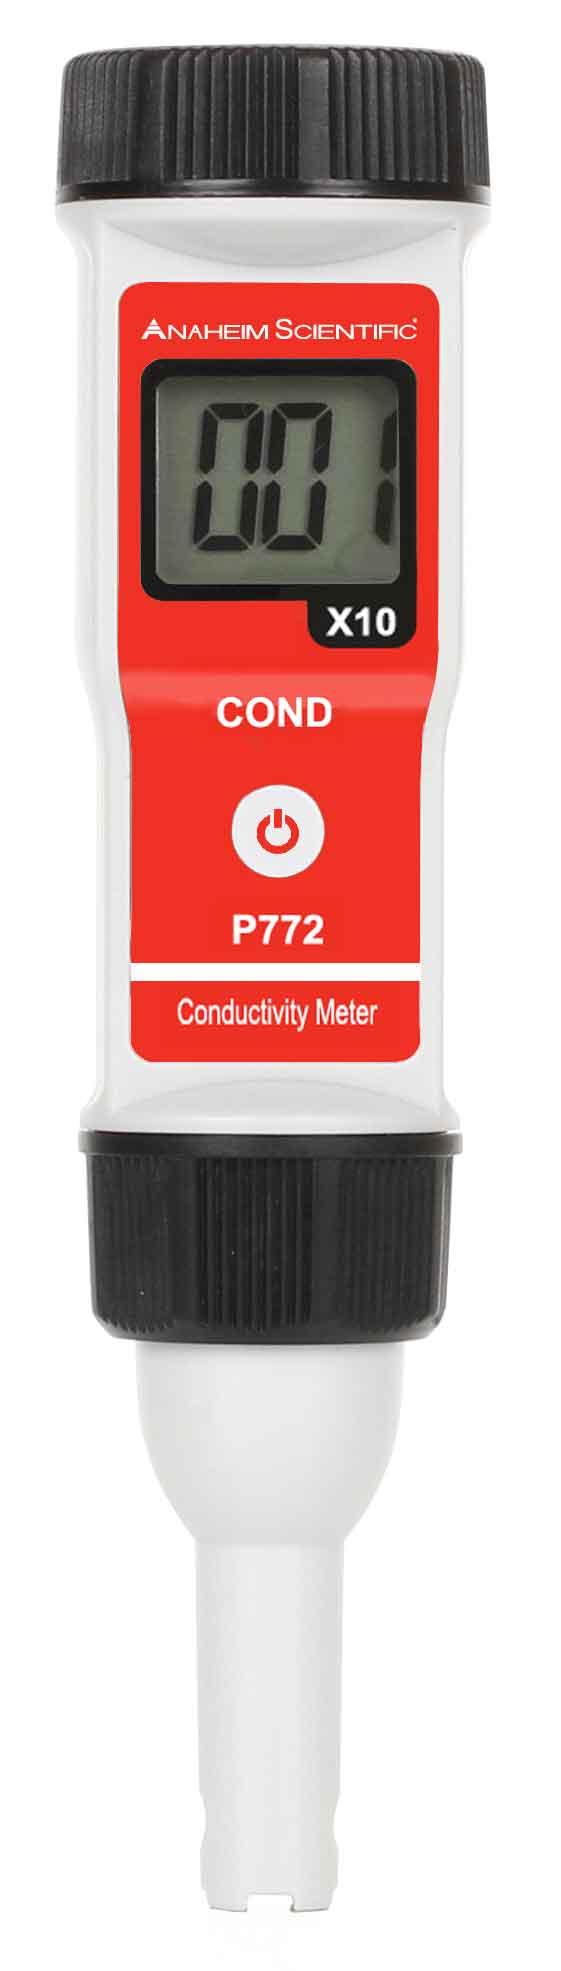 Global Specialties P772 Conductivity Meter Photo